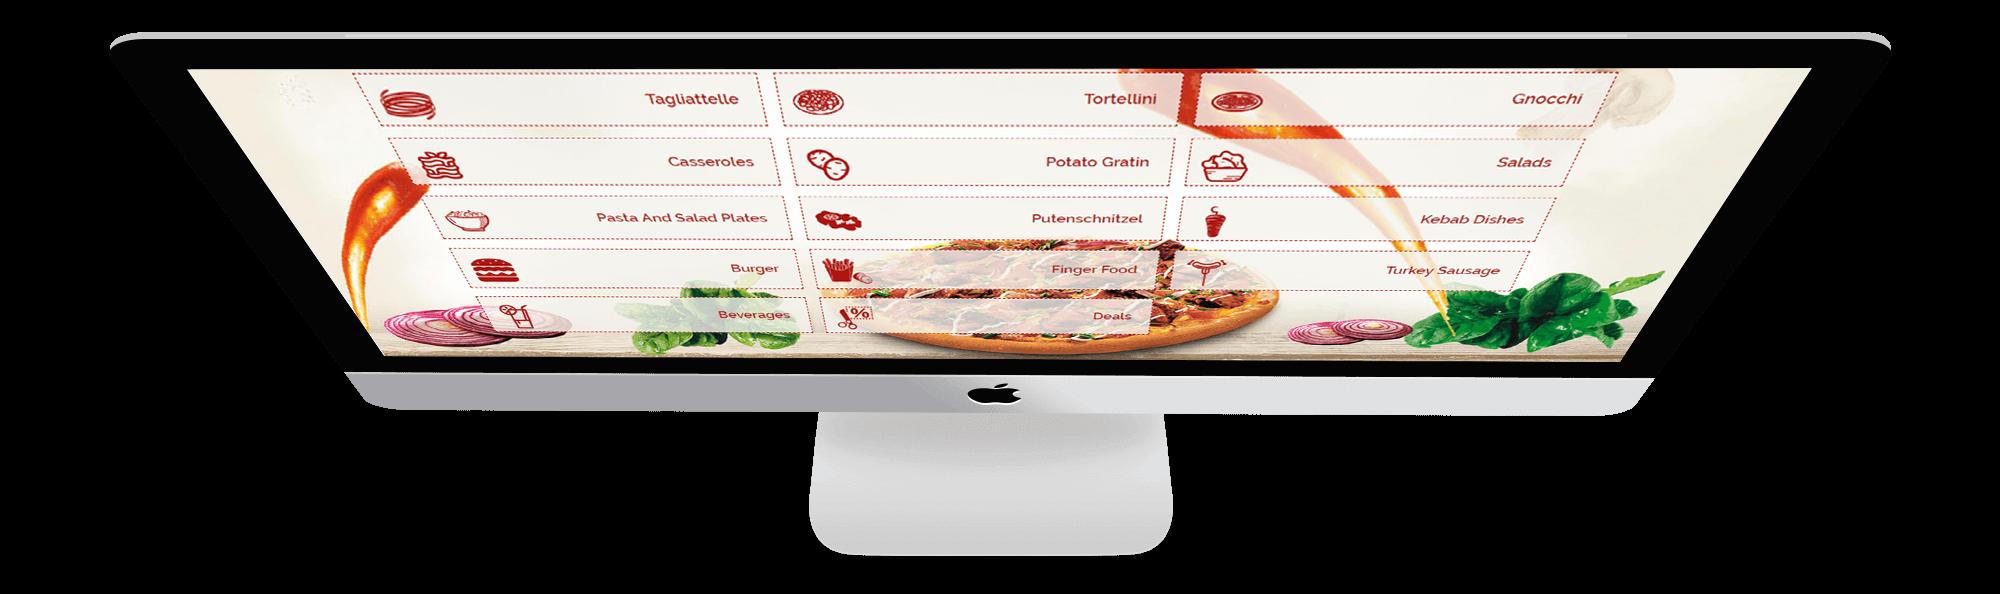 Brandcrock-pizza-plaza_imac